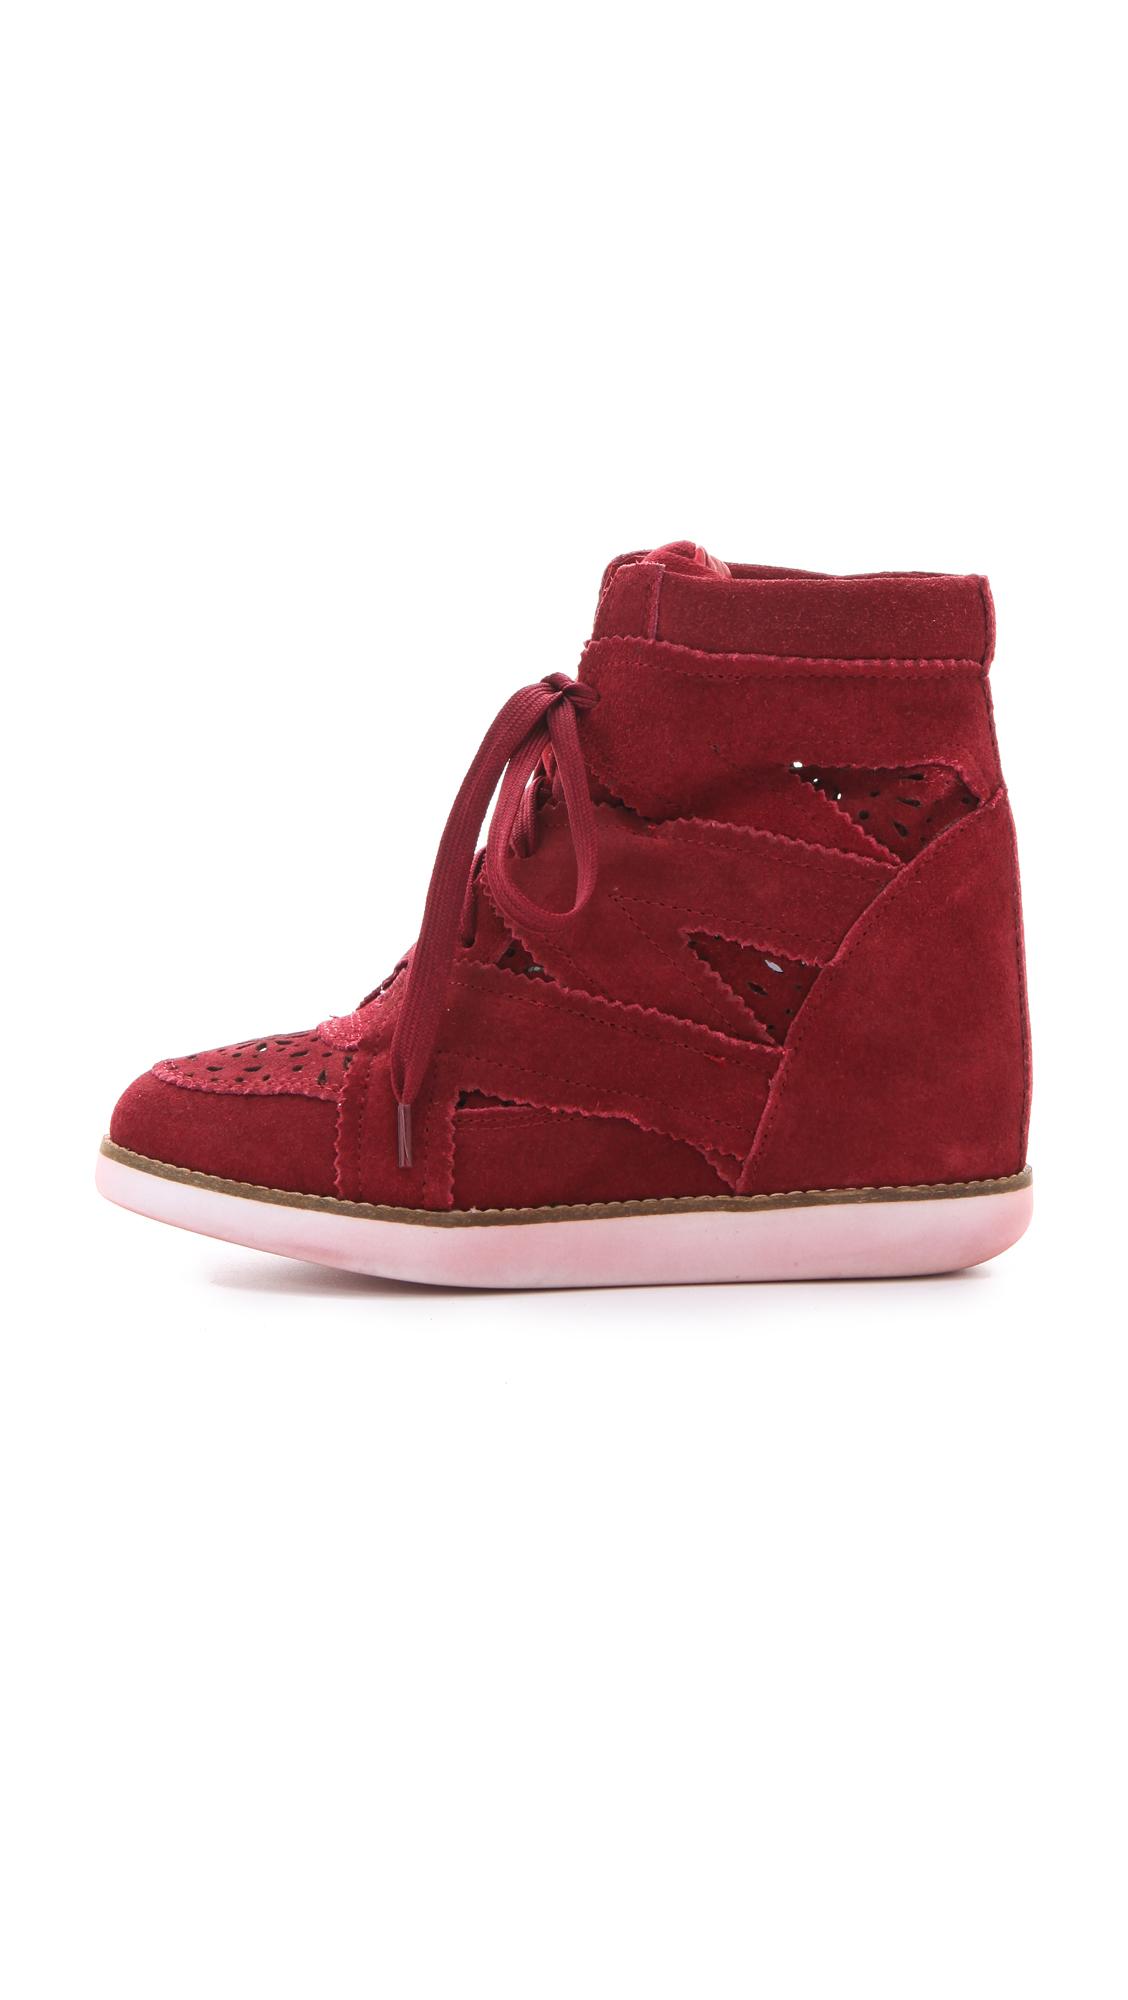 half off f010f a6e8d Jeffrey Campbell Venice Platform Sneakers  SHOPBOP